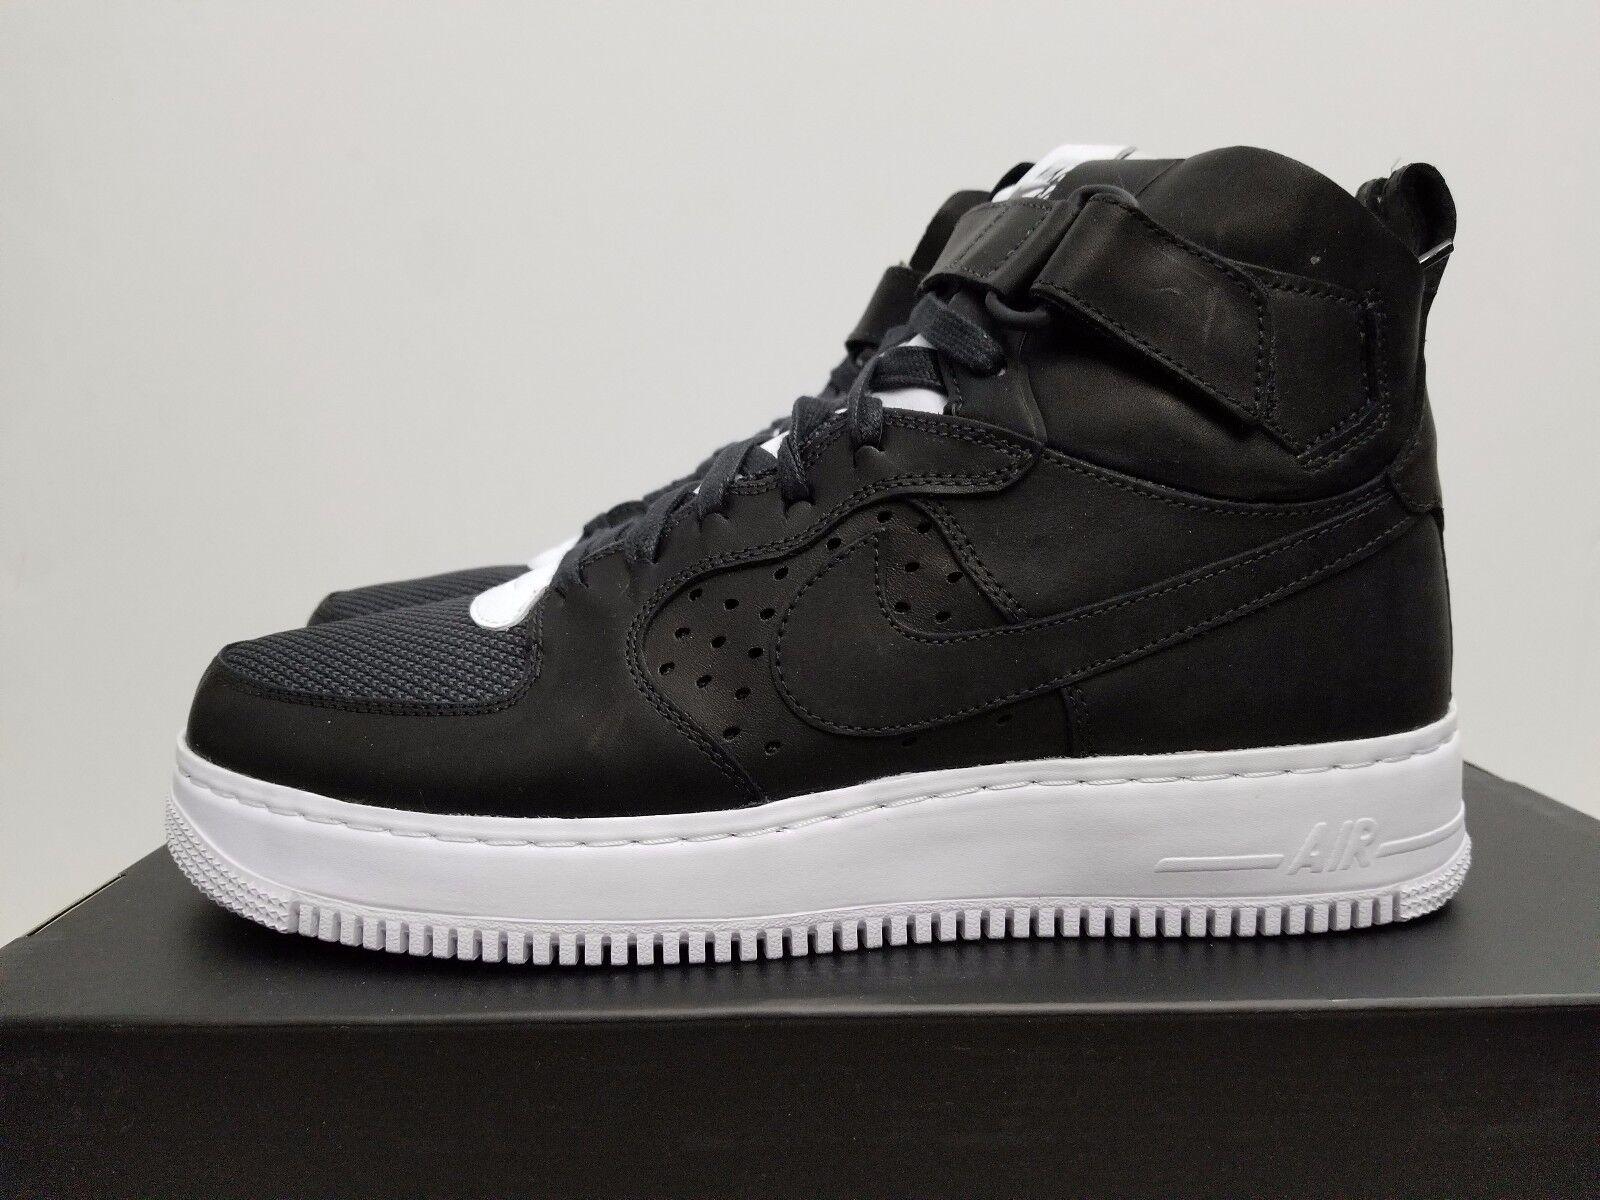 Force Air NikeLab 1 SP 9 11 Size Black White 917494 001 TC